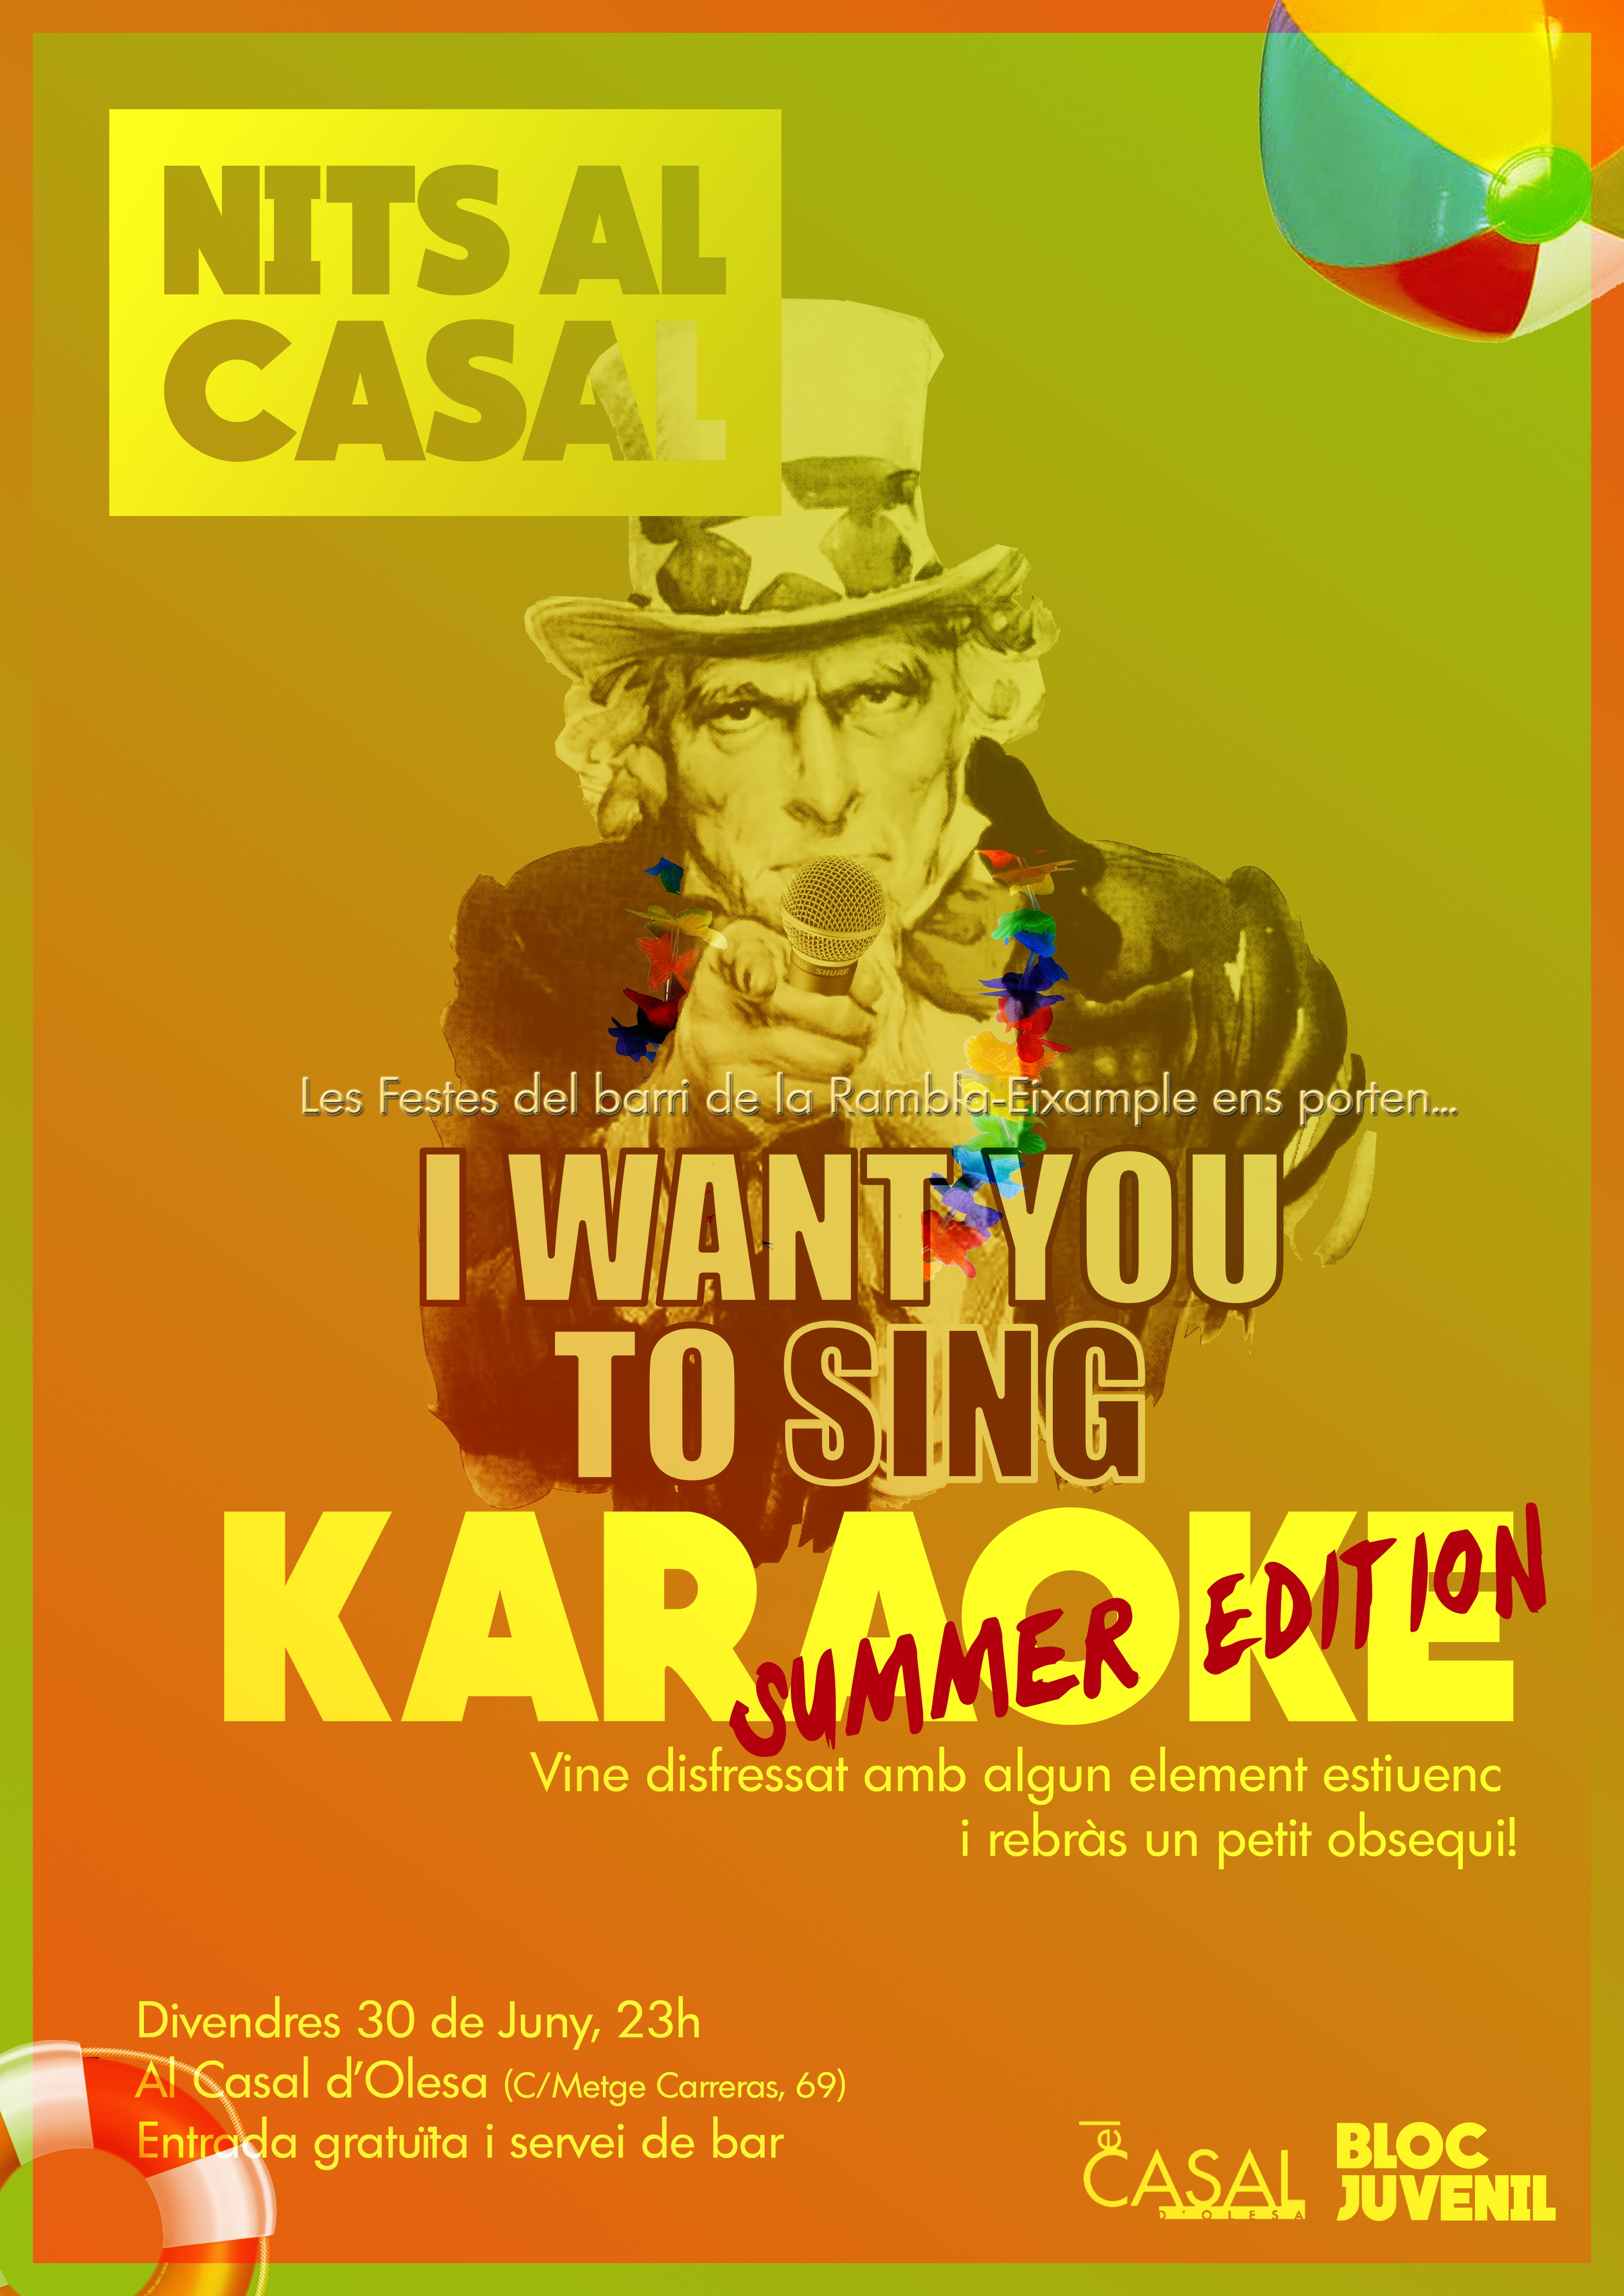 Karaoke summer edition